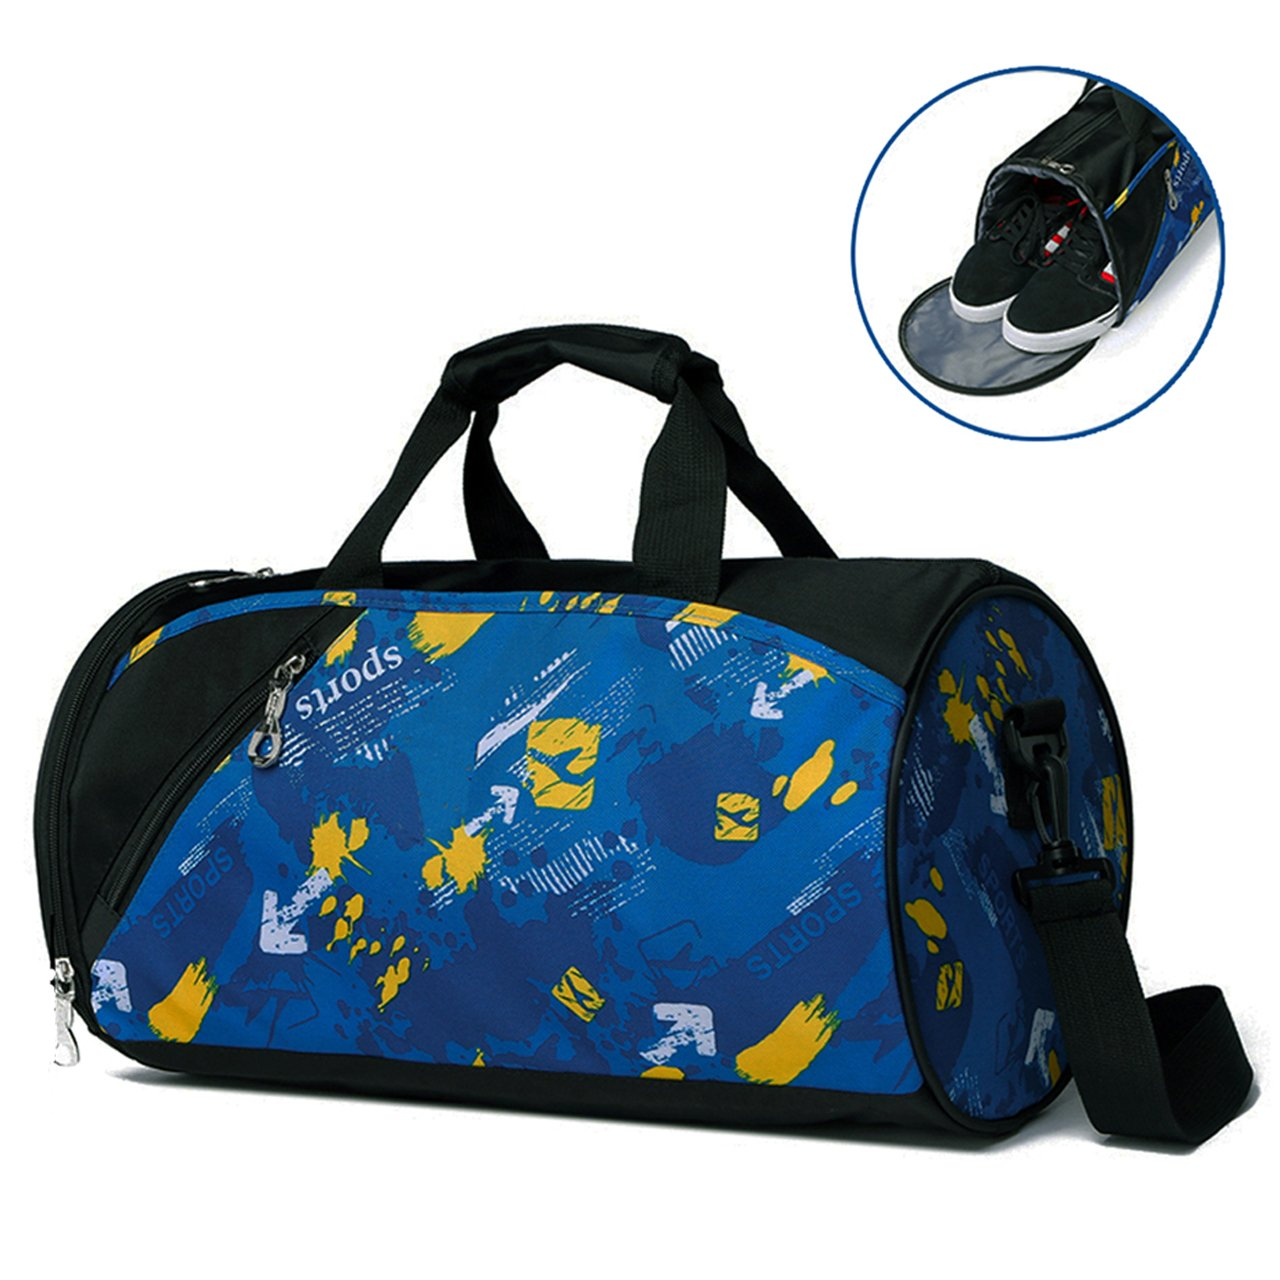 faletoキャンバススポーツダッフルバッグジムトートバッグwith Shoeコンパートメントフィットネスヨガ機器バッグ防水メンズ&レディース B07CSKB992 #3 Blue #3 Blue